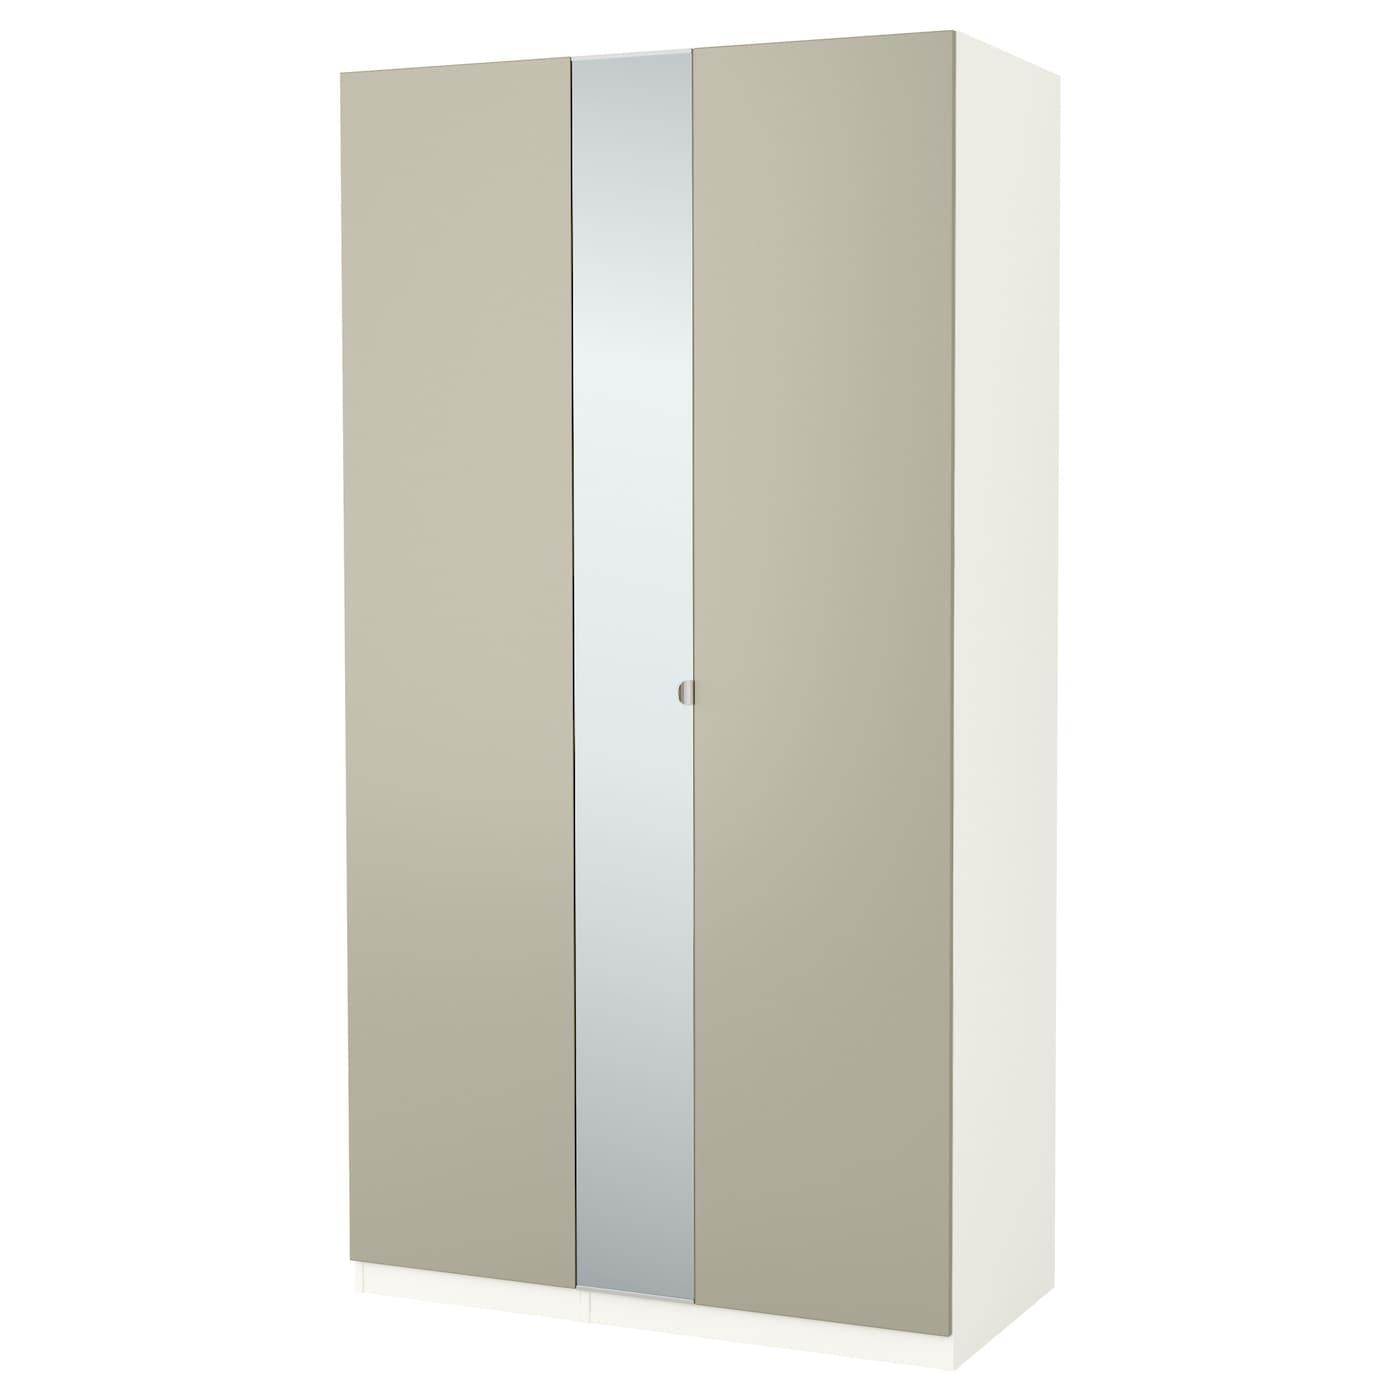 Dressing 30 Cm Profondeur pax armoire-penderie - blanc, forsand vikedal 125x60x236 cm